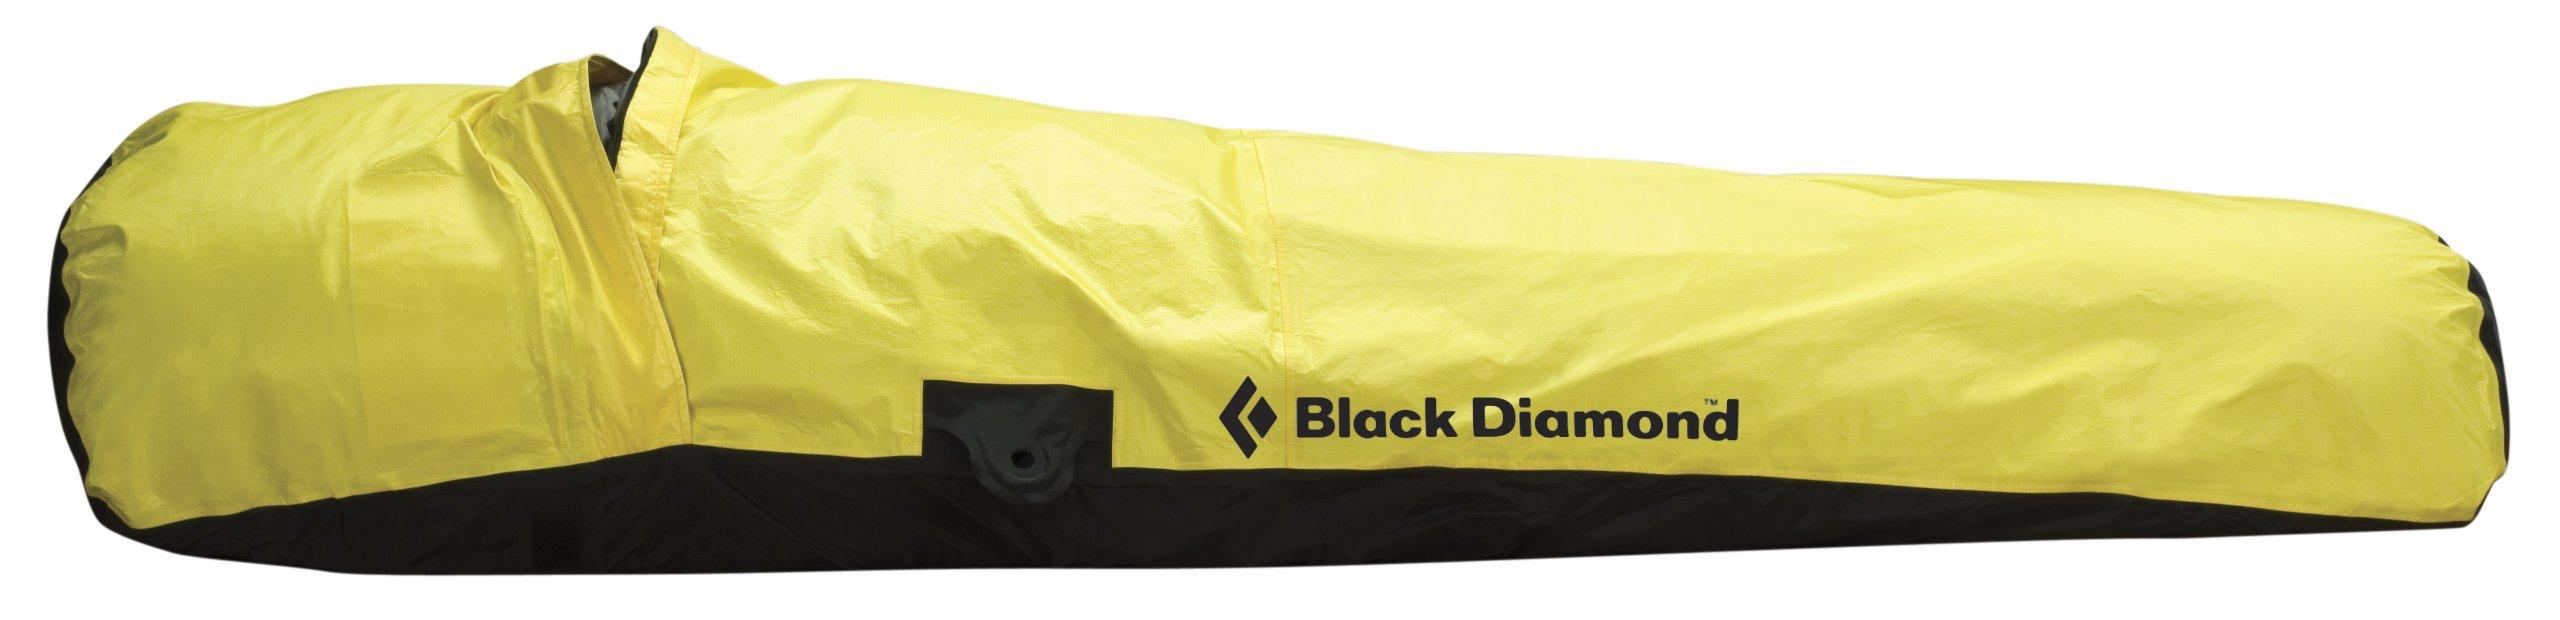 Black Diamond Big Wall Bivy